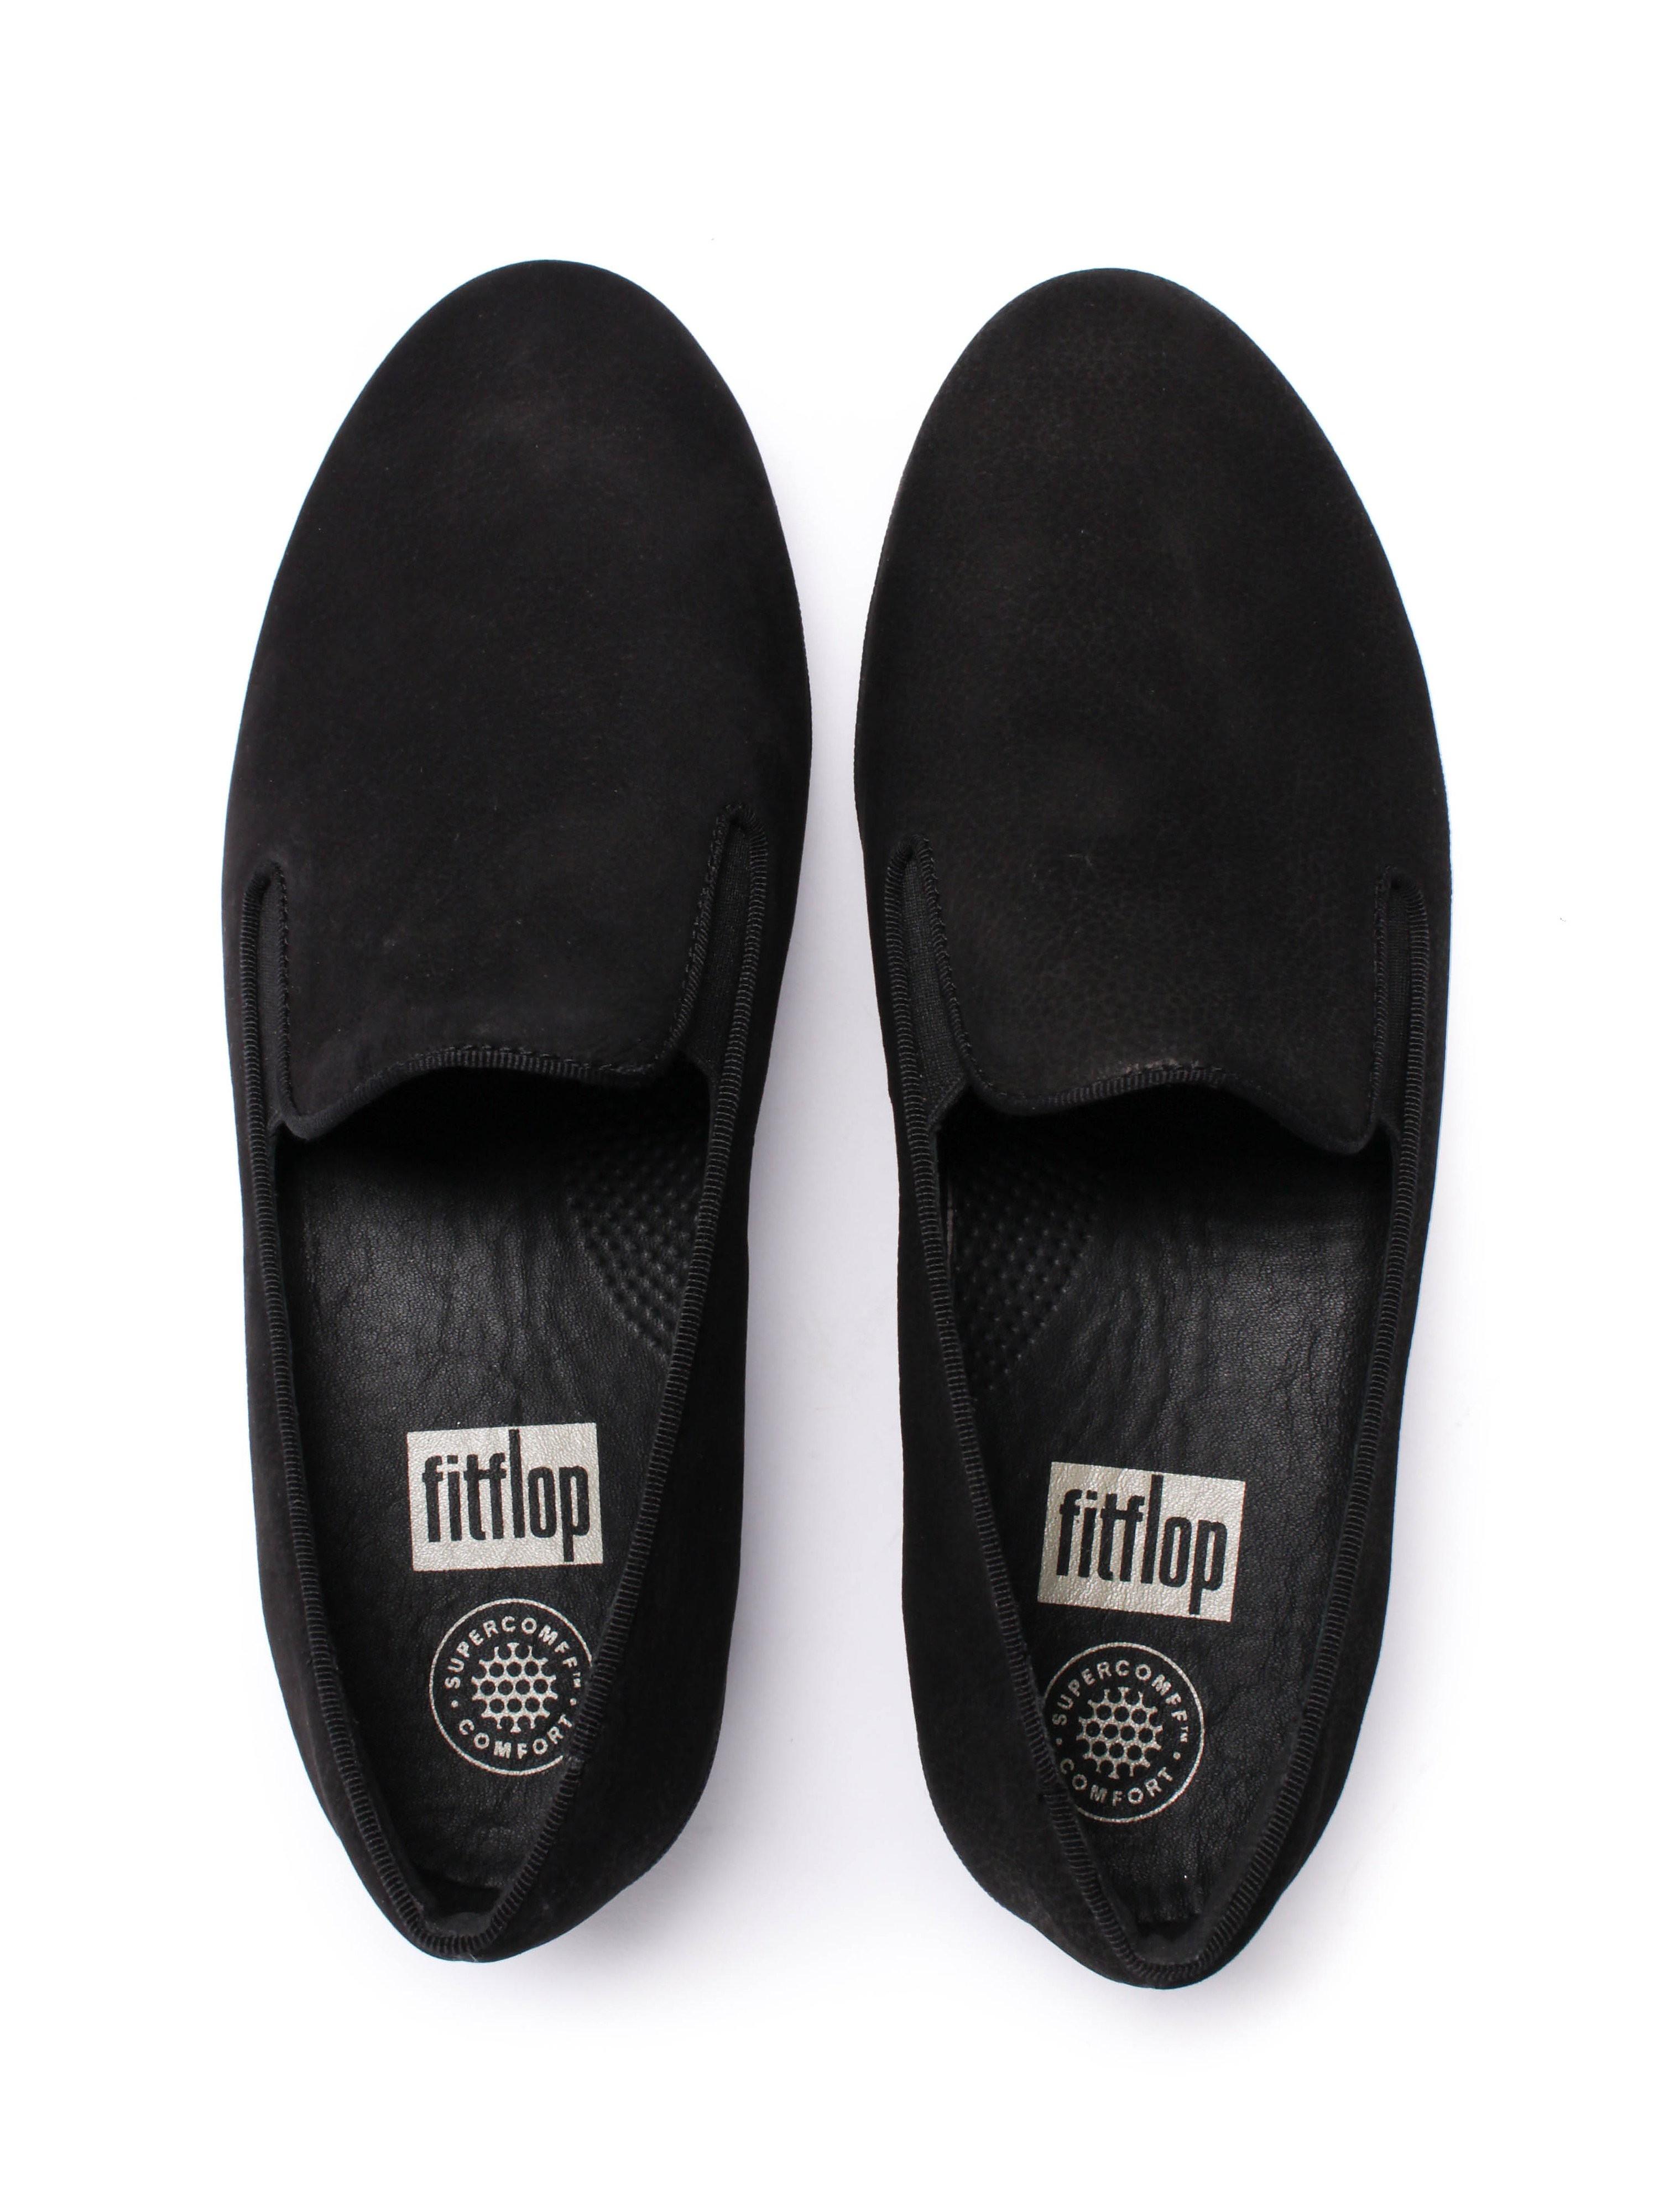 FitFlop Womens Superskate™ Shoe - Black